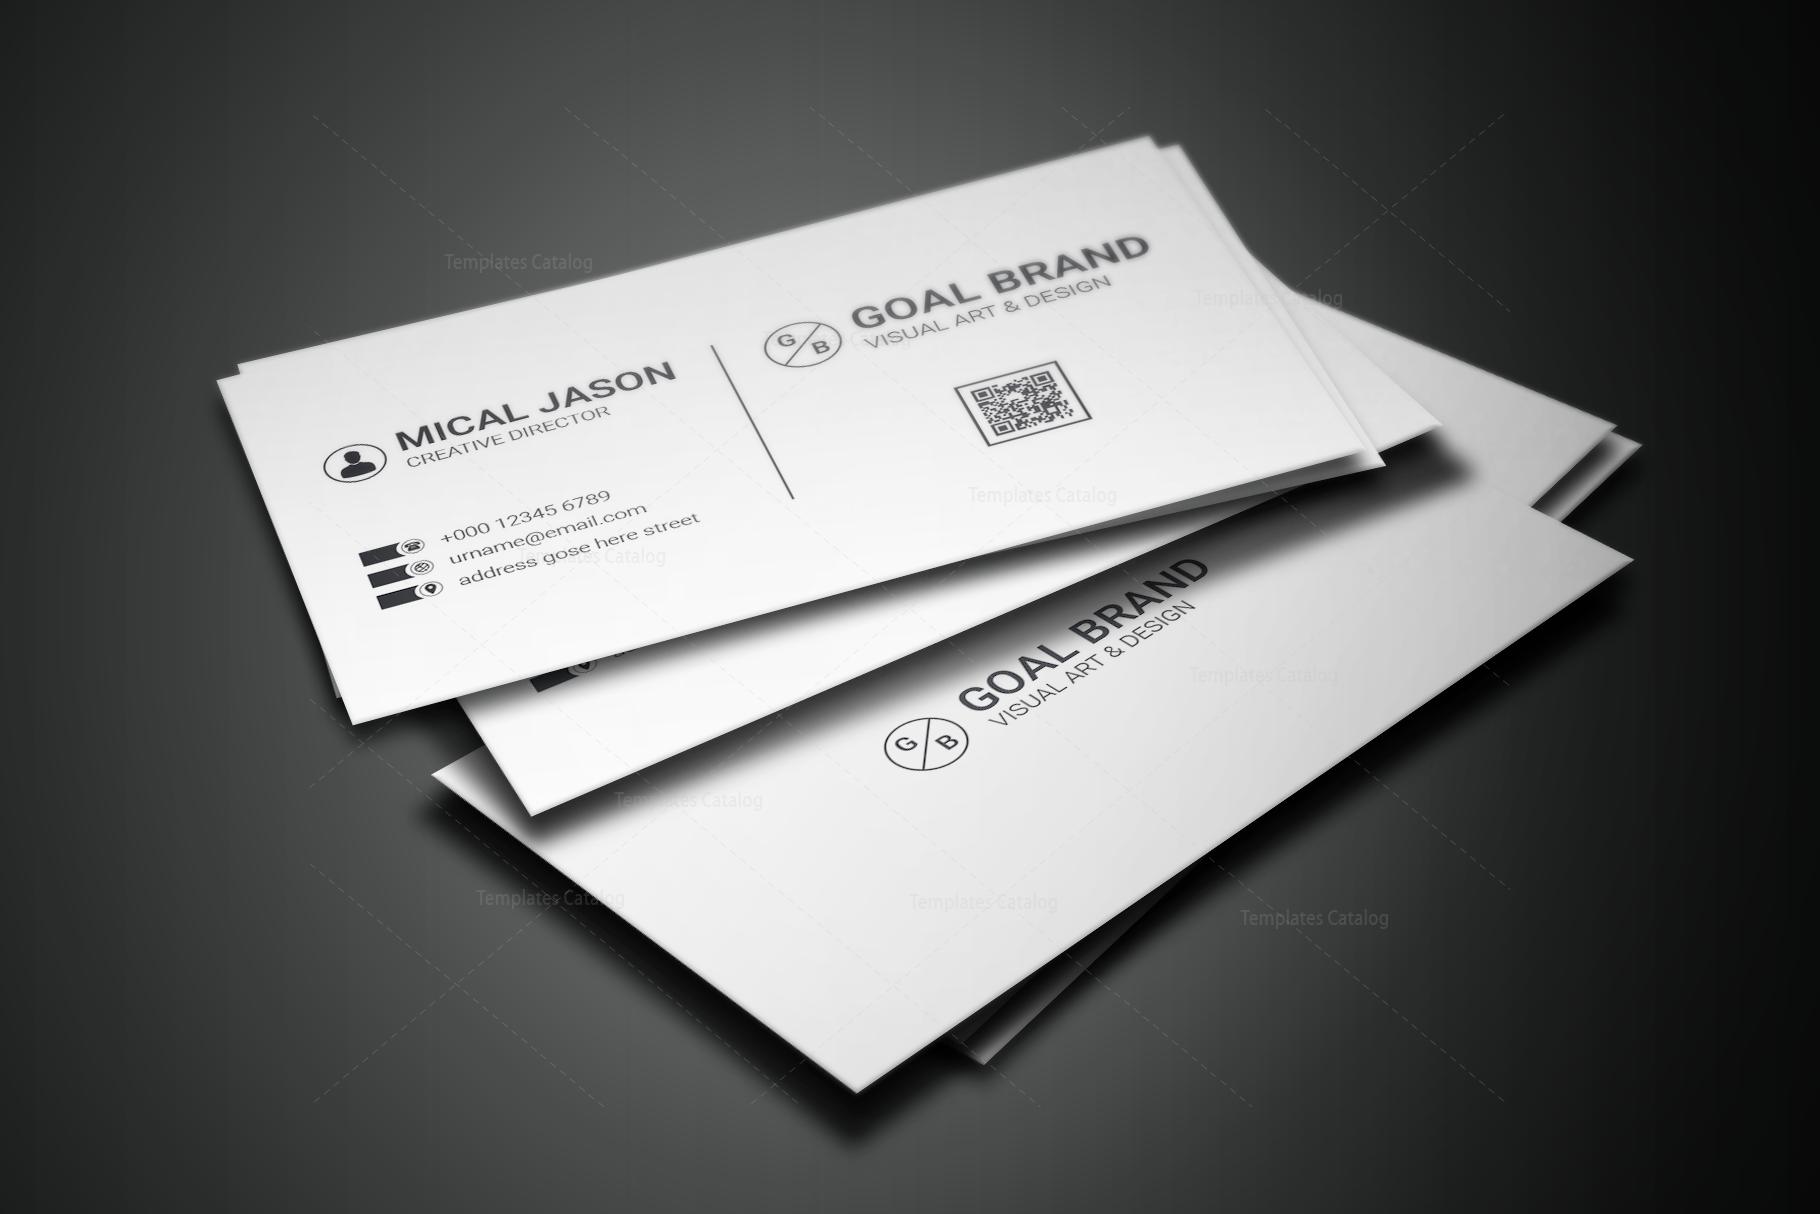 Simple Creative Business Card Design 001664 - Template Catalog